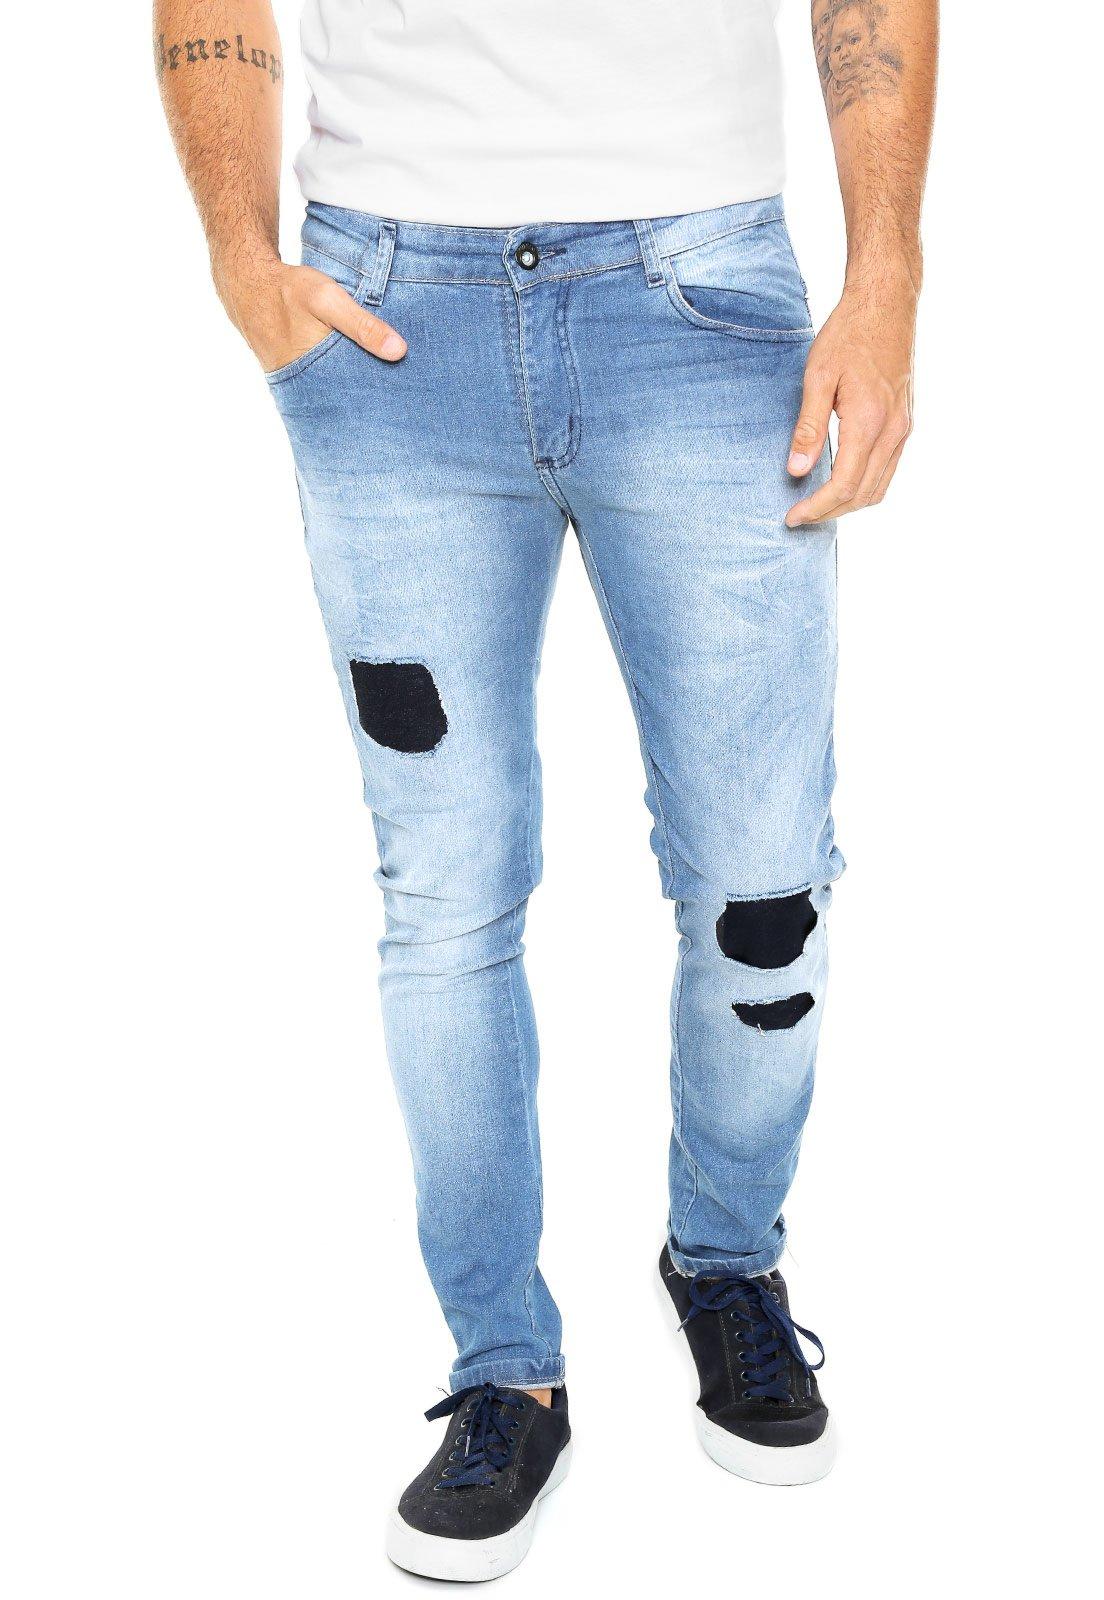 9fbf1b4e4c4ac Calça Jeans FiveBlu Reta Cincinnati Azul - Compre Agora